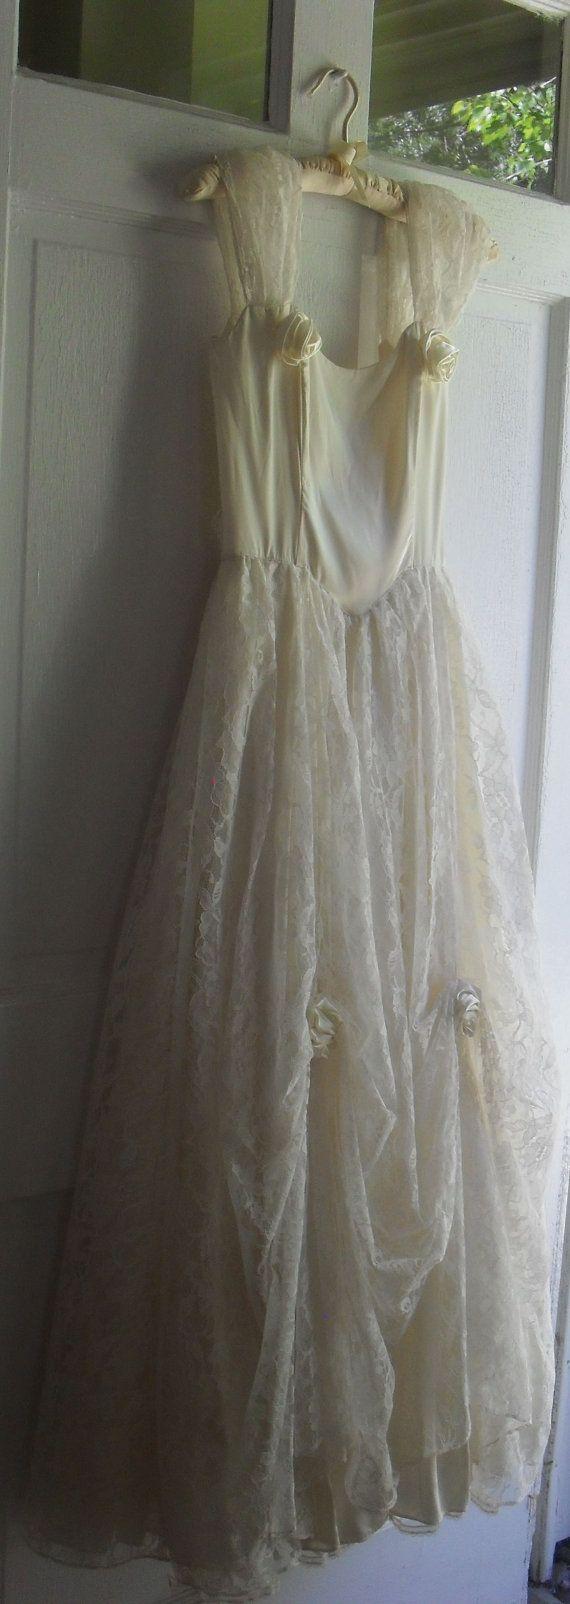 Gunne sax wedding dress  Vintage s Gunne Sax by Jessica McClintock by vintagetree